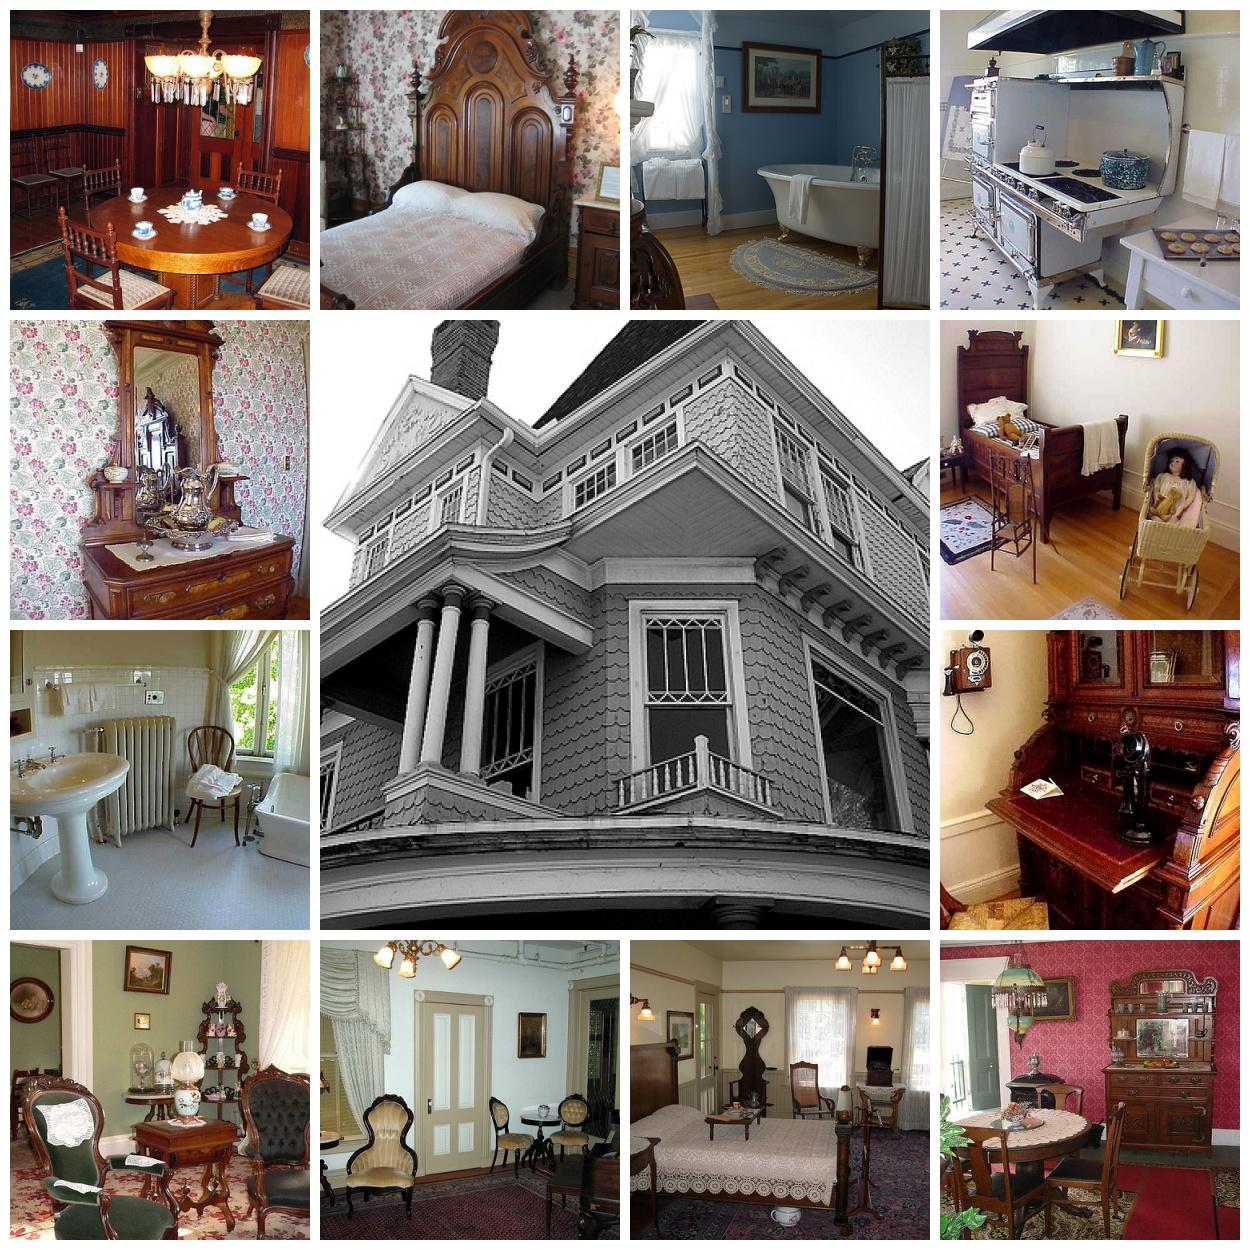 Victorian Home Interior Design: Victorian Interior Design And Residential Architecture